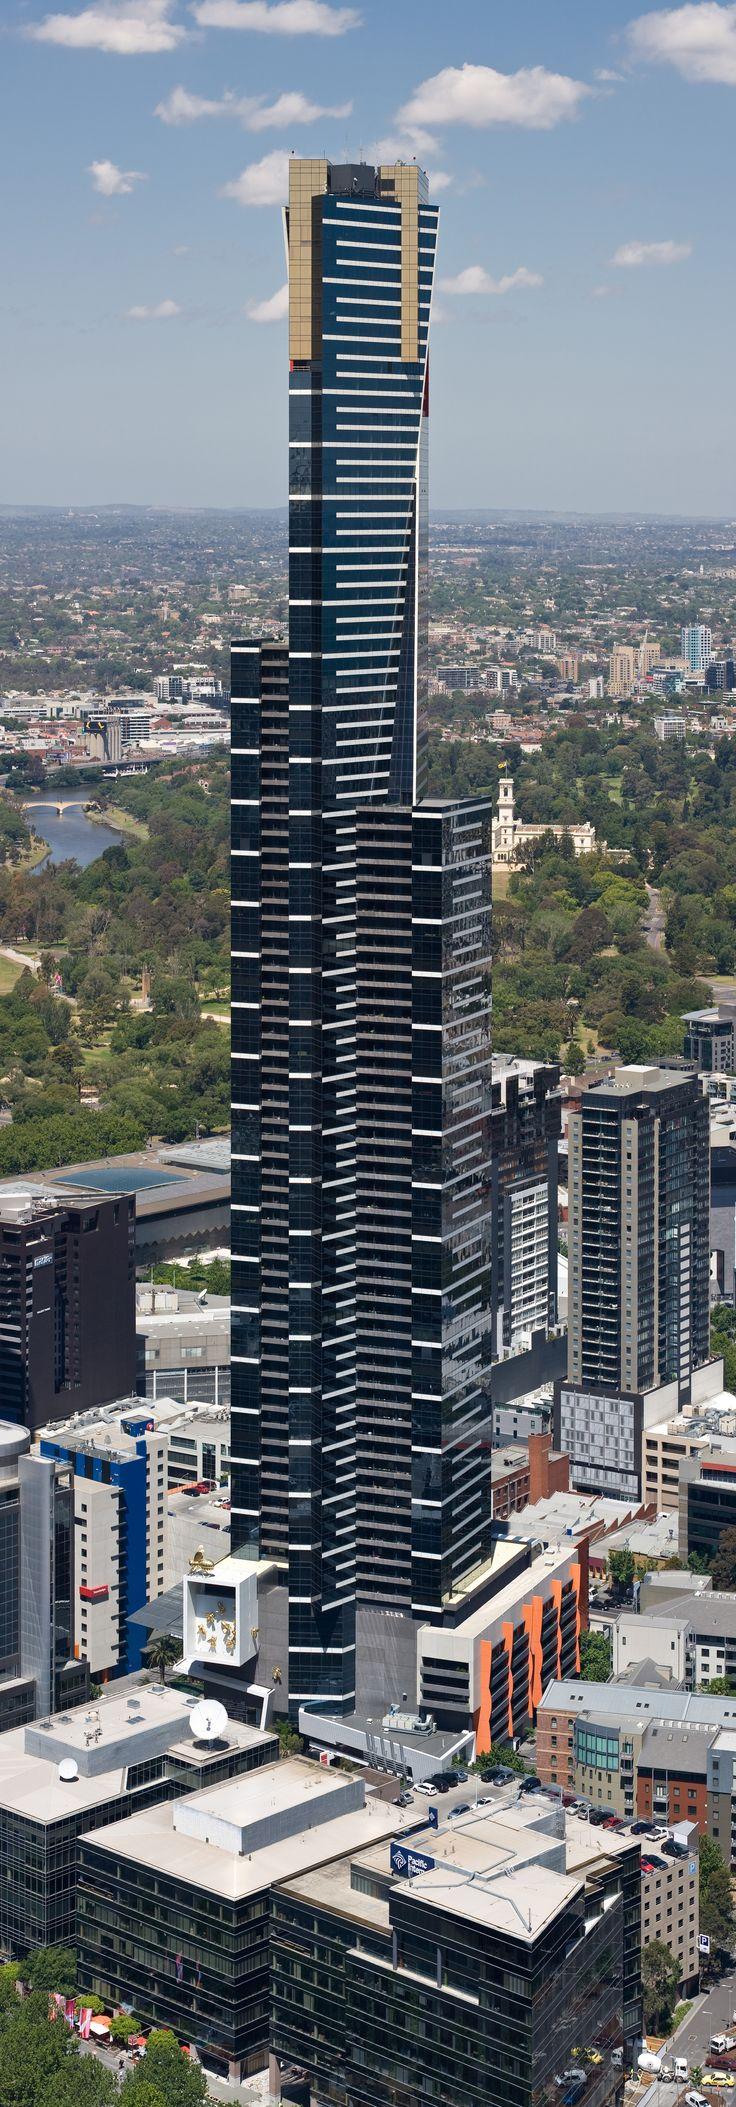 "ArchitectureVisit Eureka Tower (297.3-metre/975 ft) skyscraper located in Melbourne, Victoria, Australia and experience the ""Cube"" Skyscrapers"